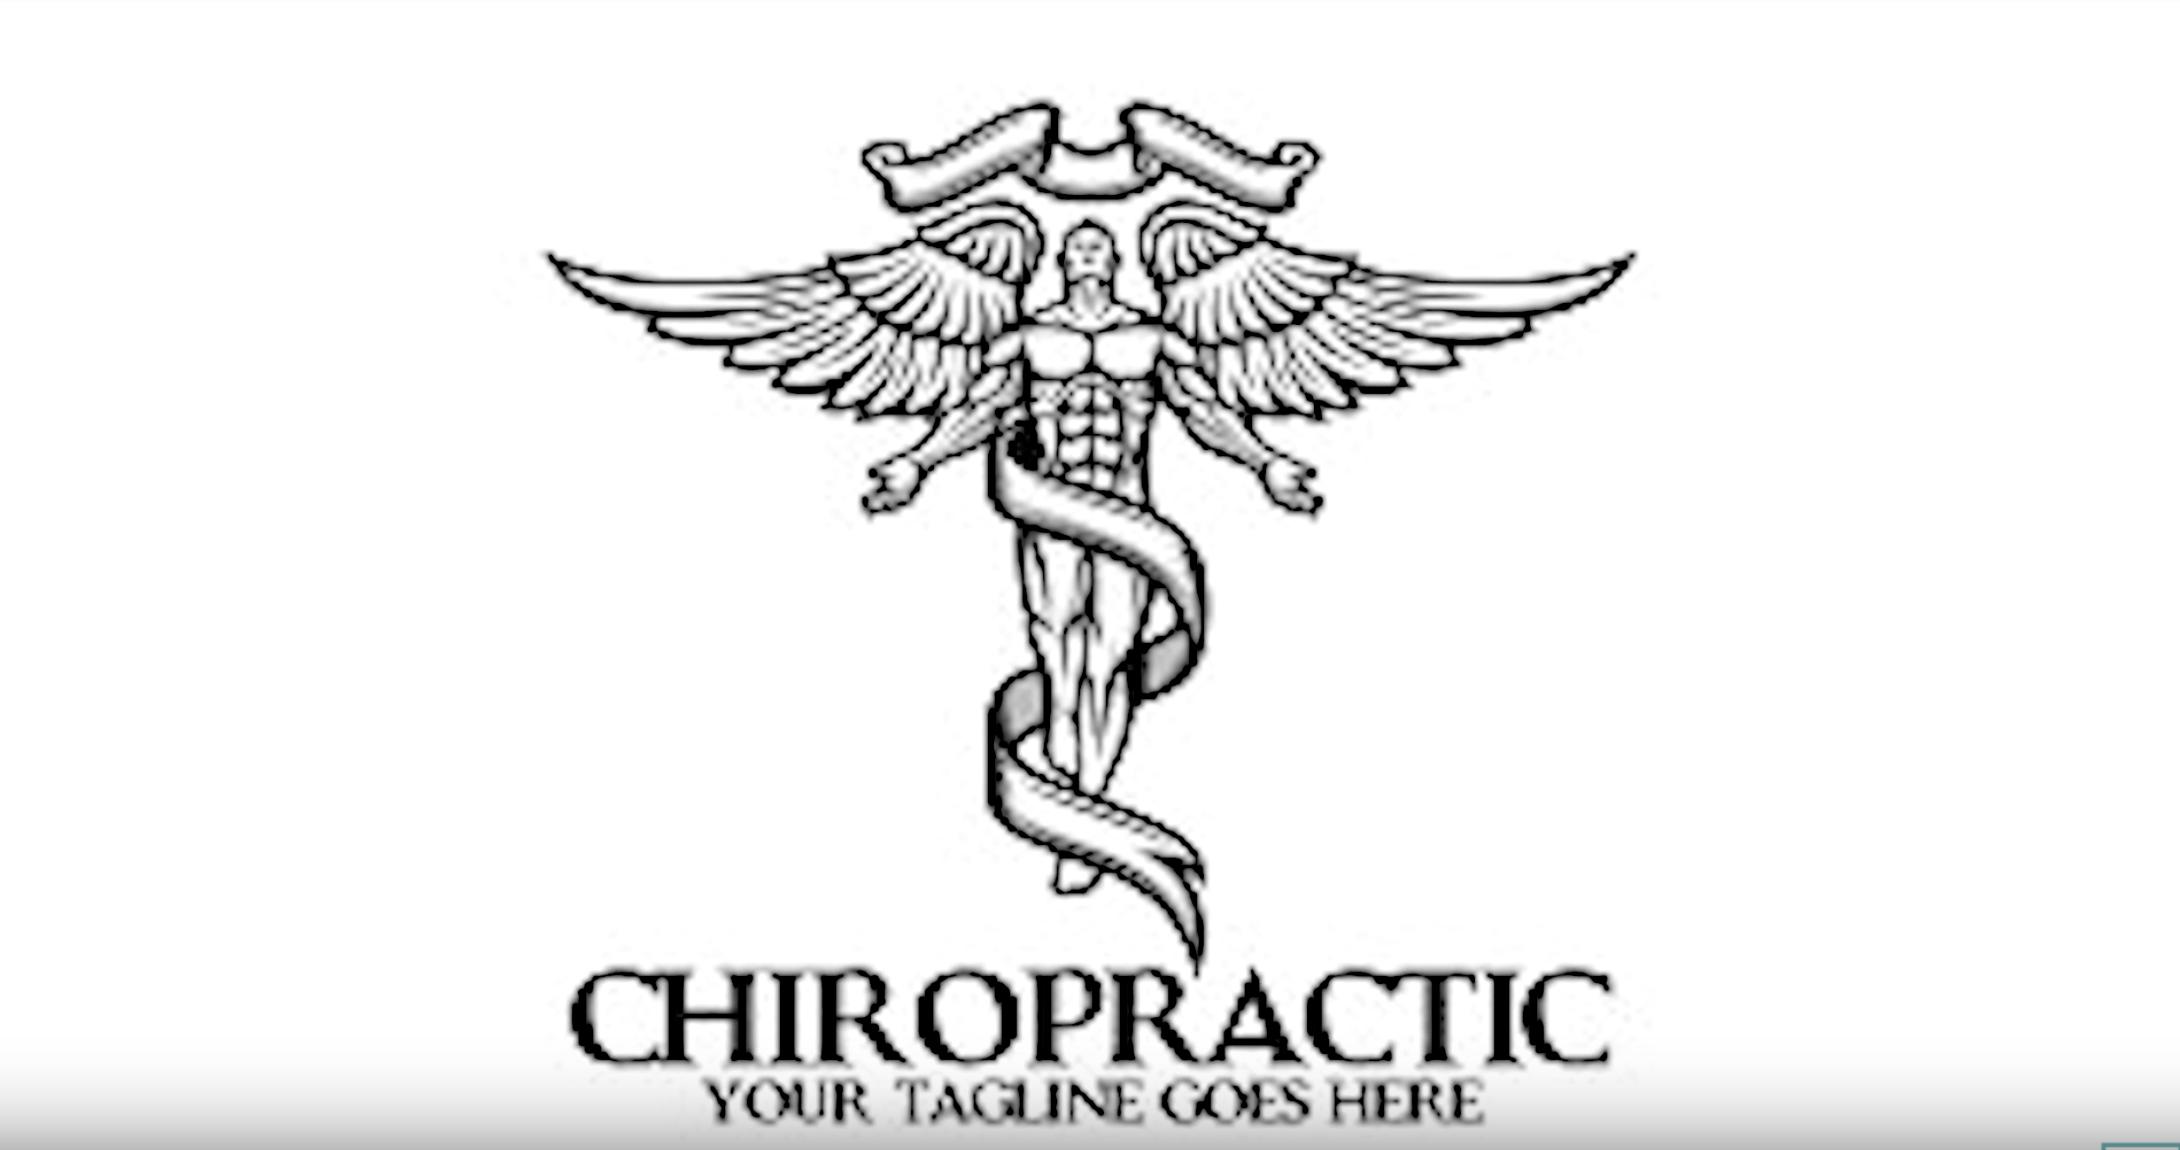 bad-chiropractic-logo.jpg